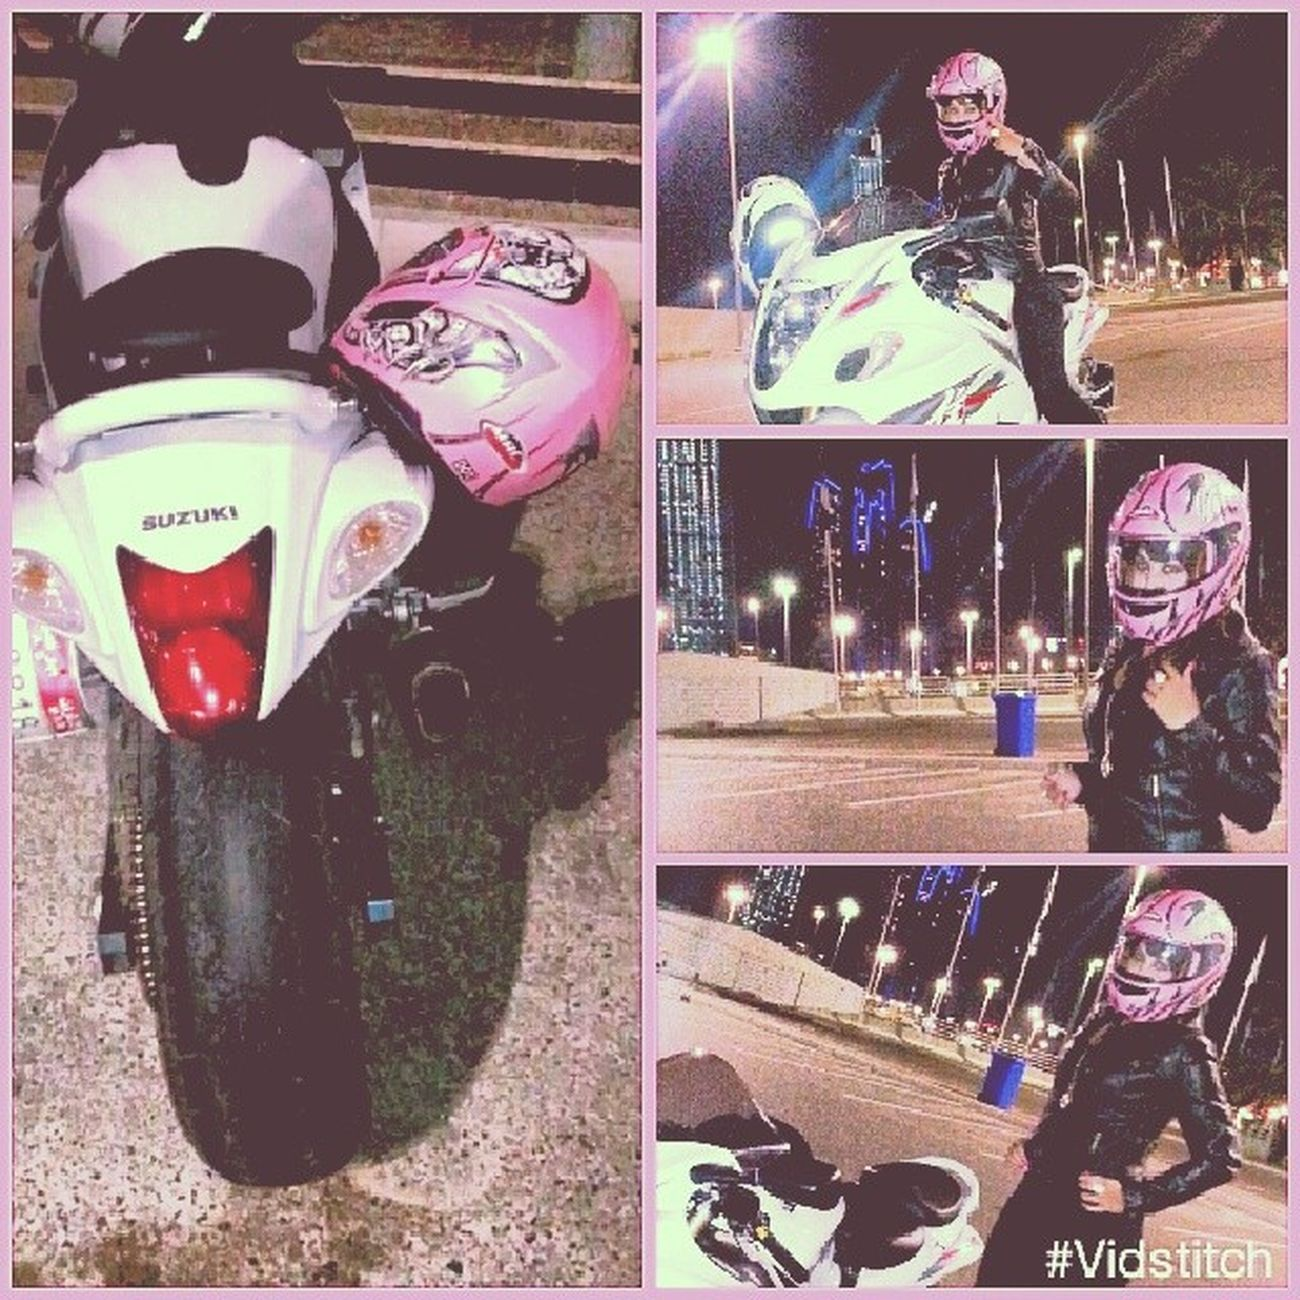 Biketime Hayabusa Happy Amazing bikergirl uae albateen cornish motorcycle biker abudhabi crazy fun loveit yolo ♡♥♡♥♡♥♡♥♡♥